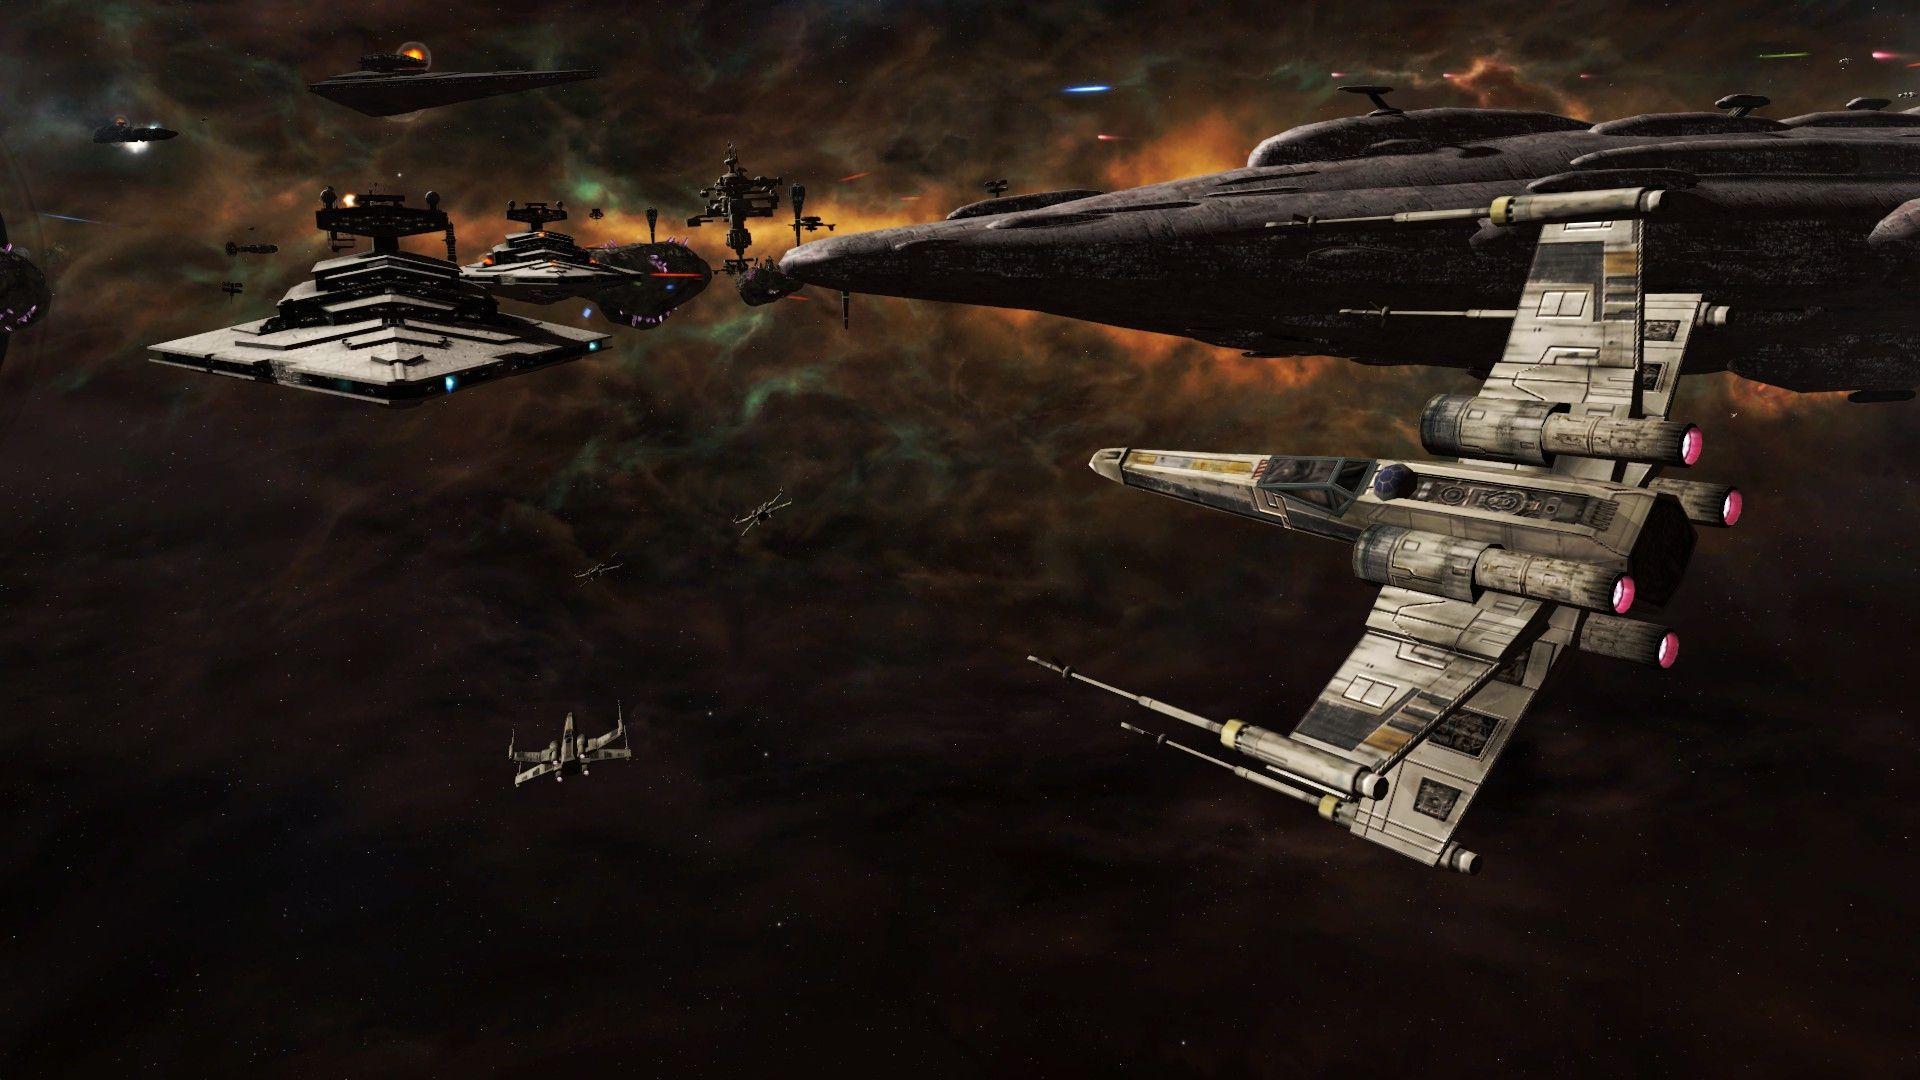 Artwork Star Wars Episode VII The Force Awakens X Wing Wallpaper Wallpapers